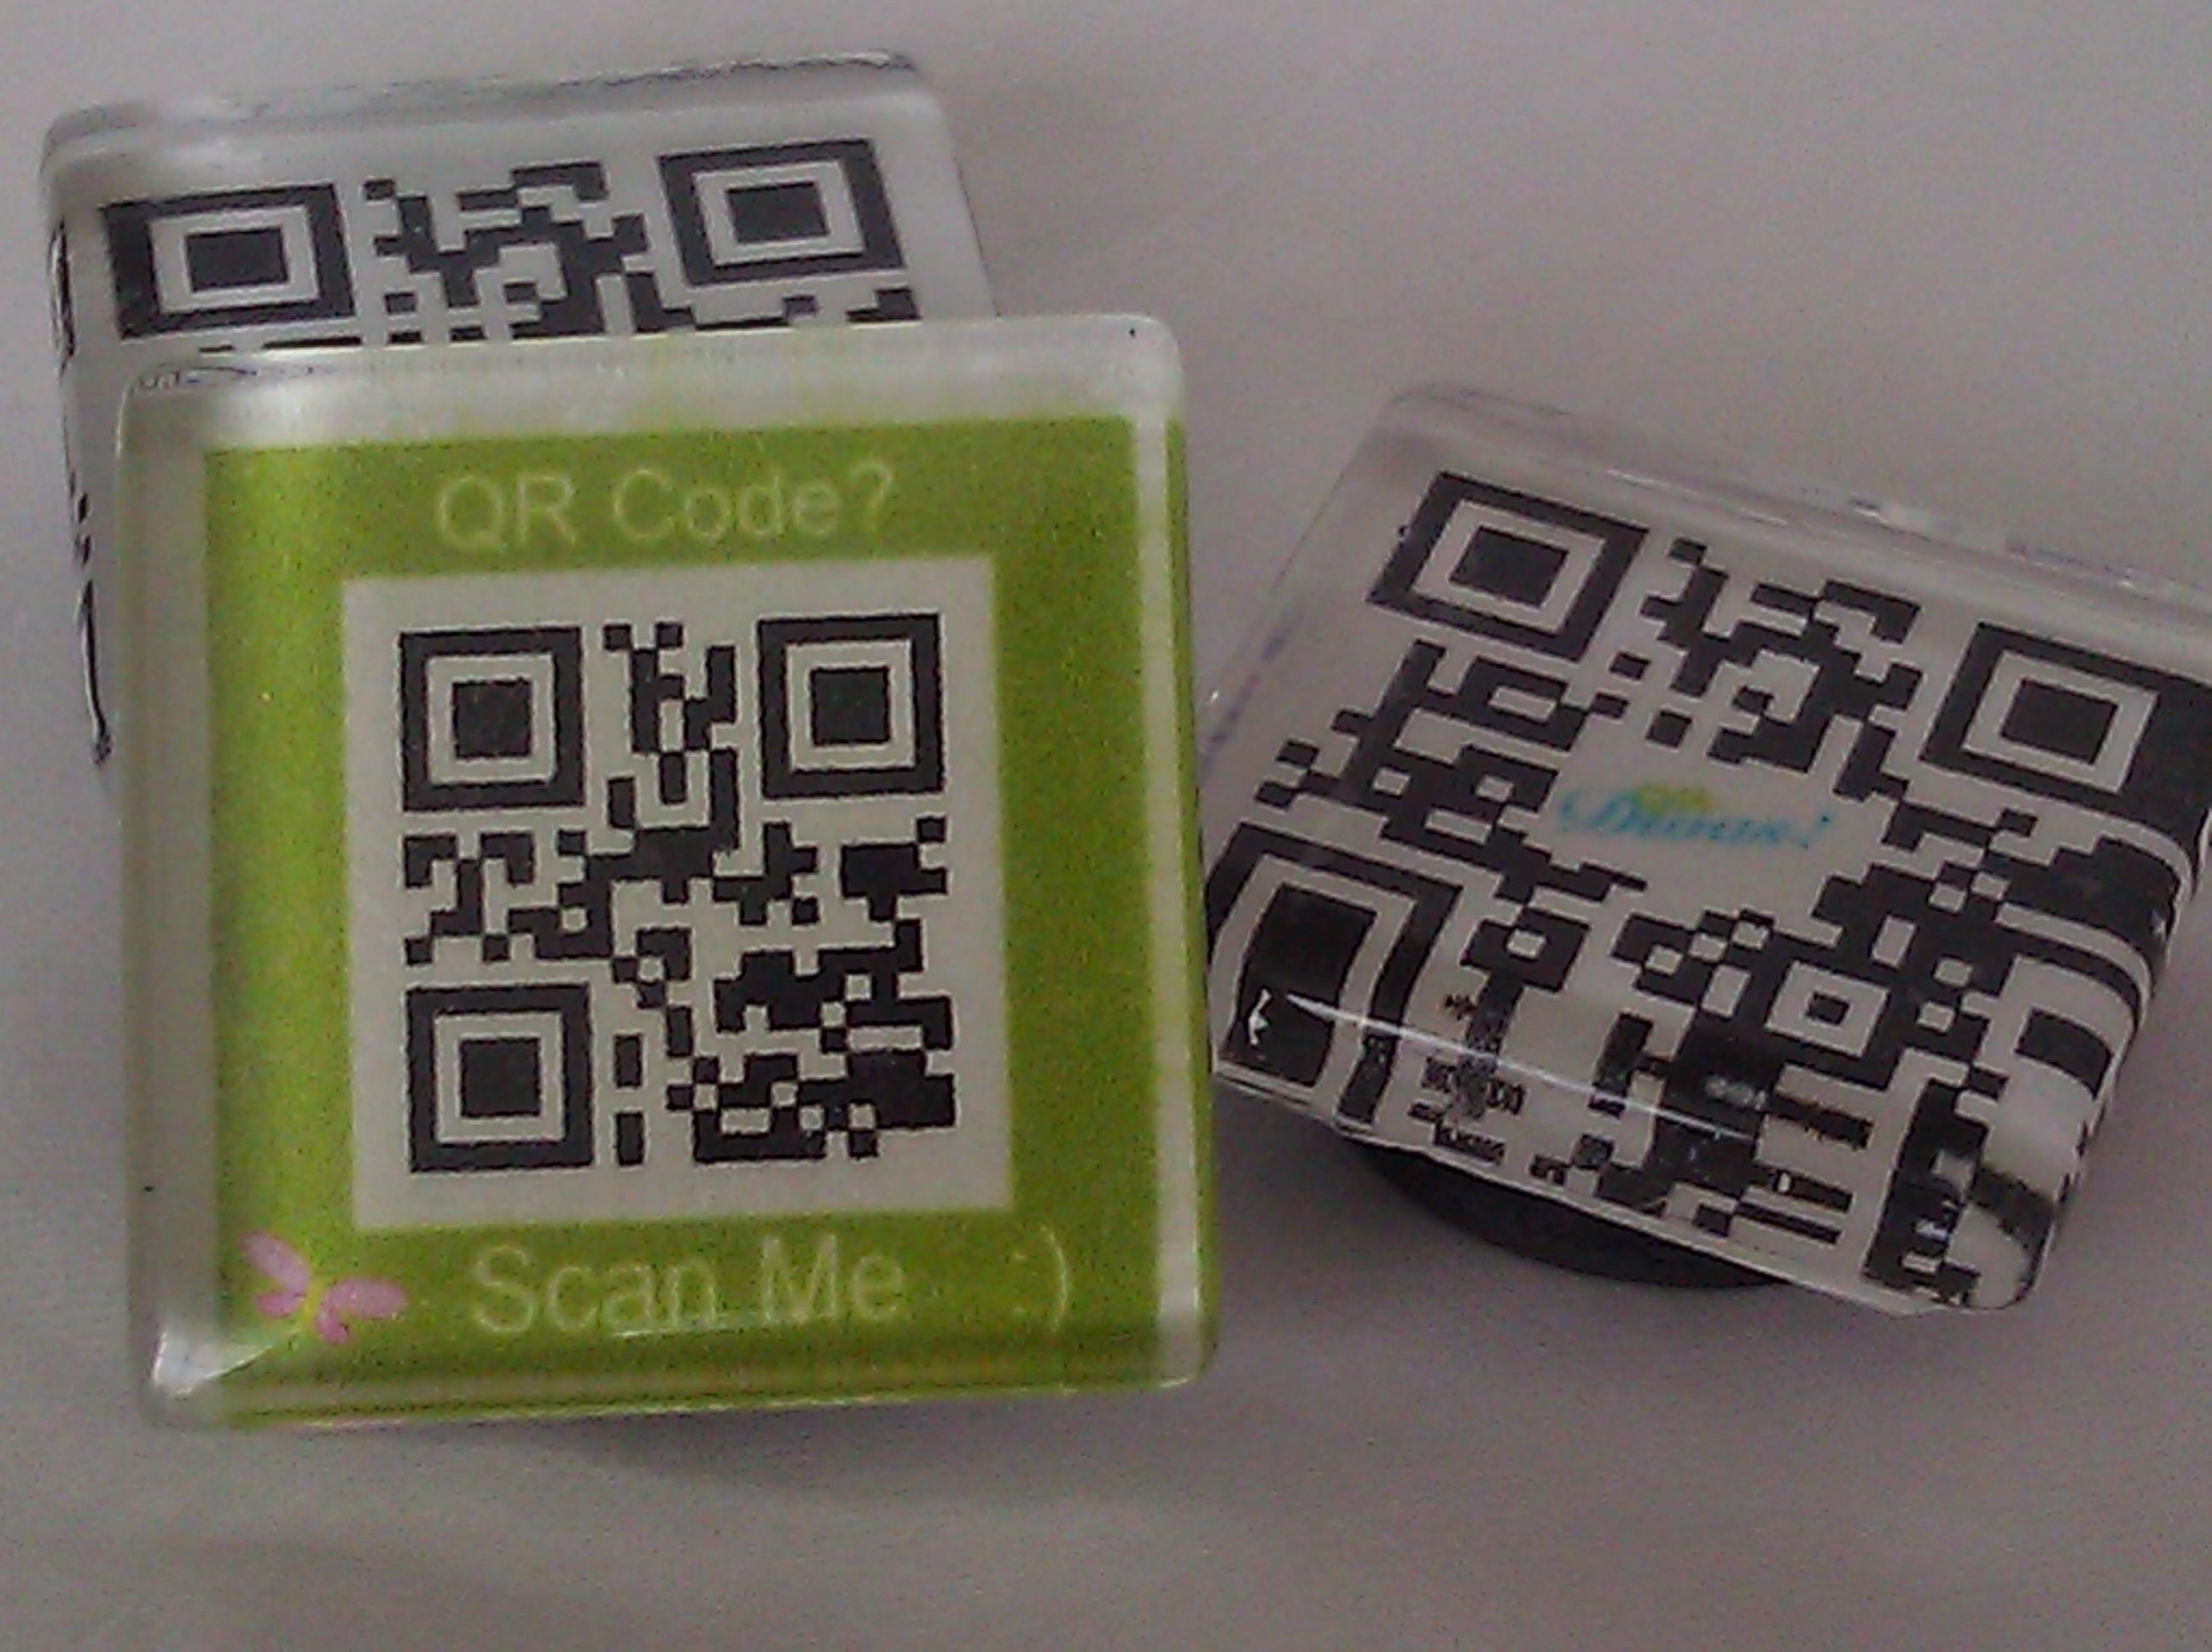 QR Code Magnets | 5 Crazy QR Code Uses